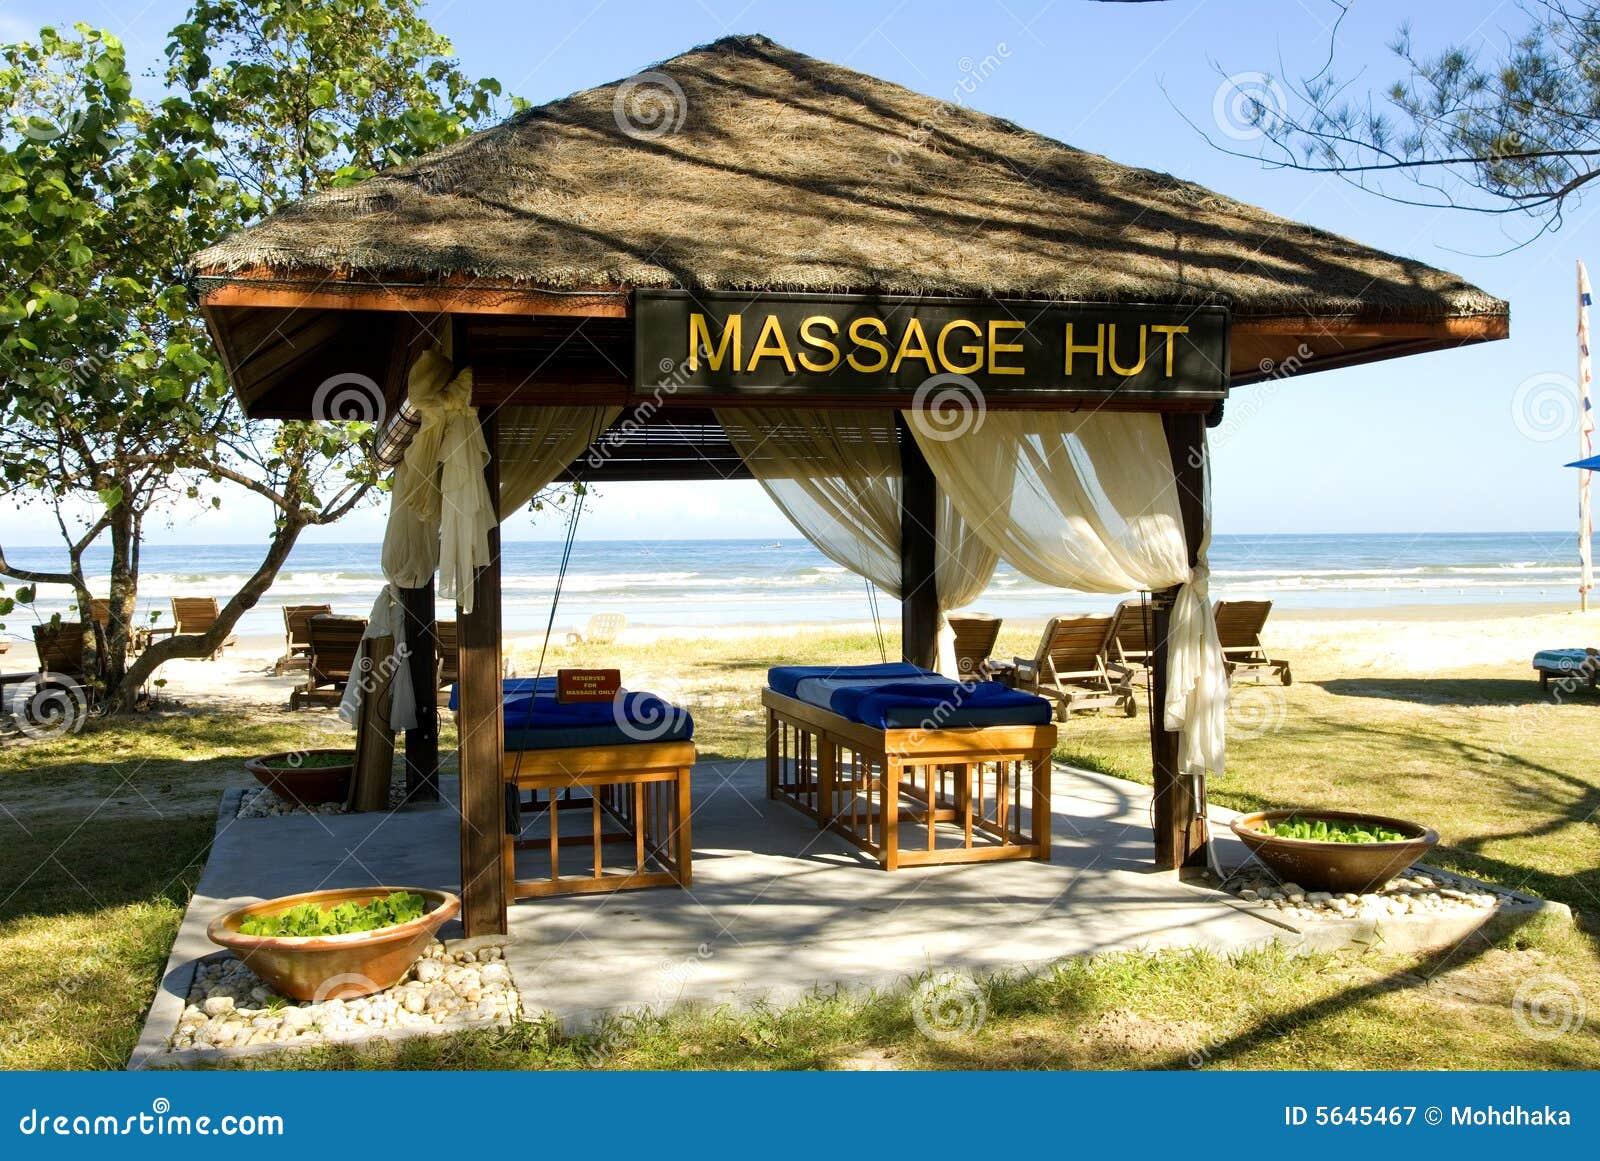 Massage tiefer hutt